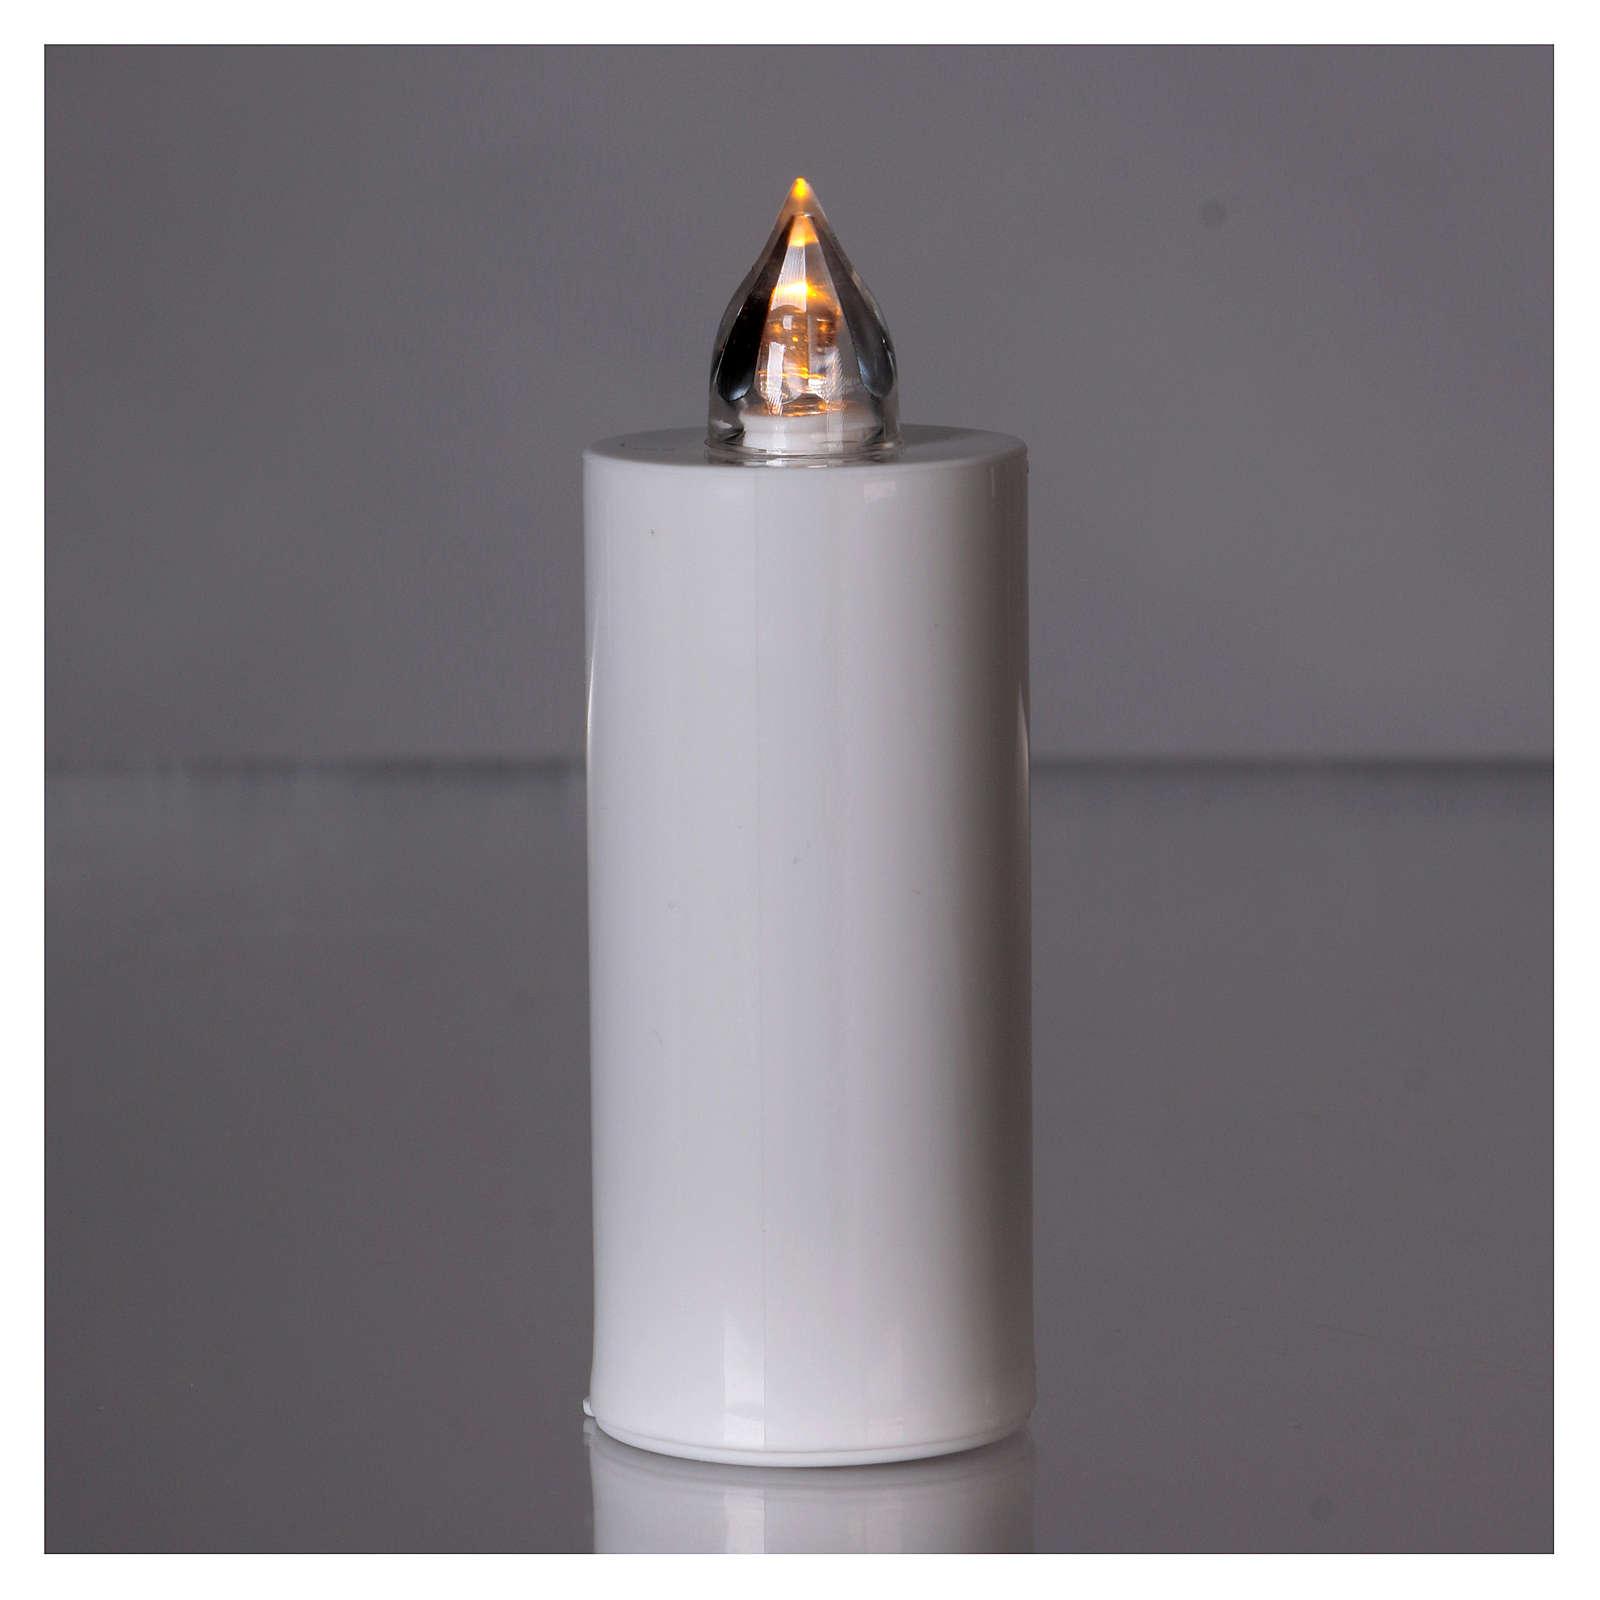 Lumada votive candle with yellow fixed light 3